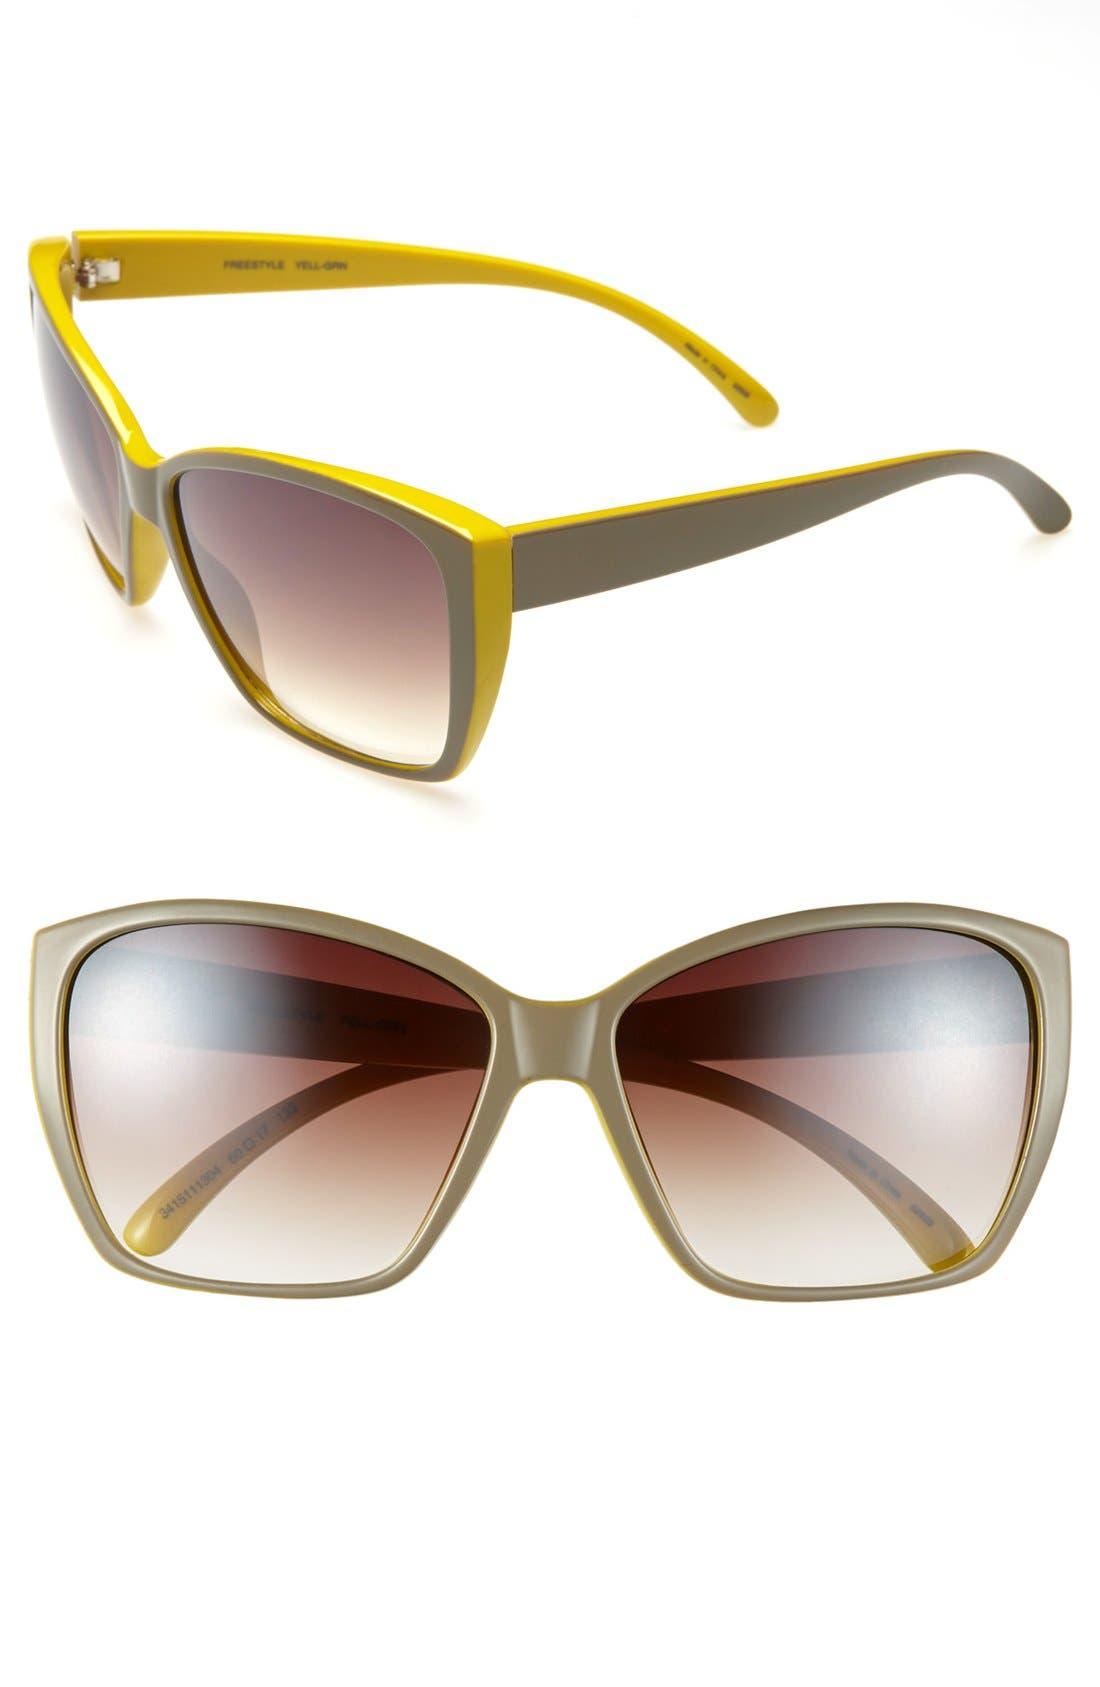 Main Image - Outlook Eyewear 'Freestyle' 60mm Sunglasses